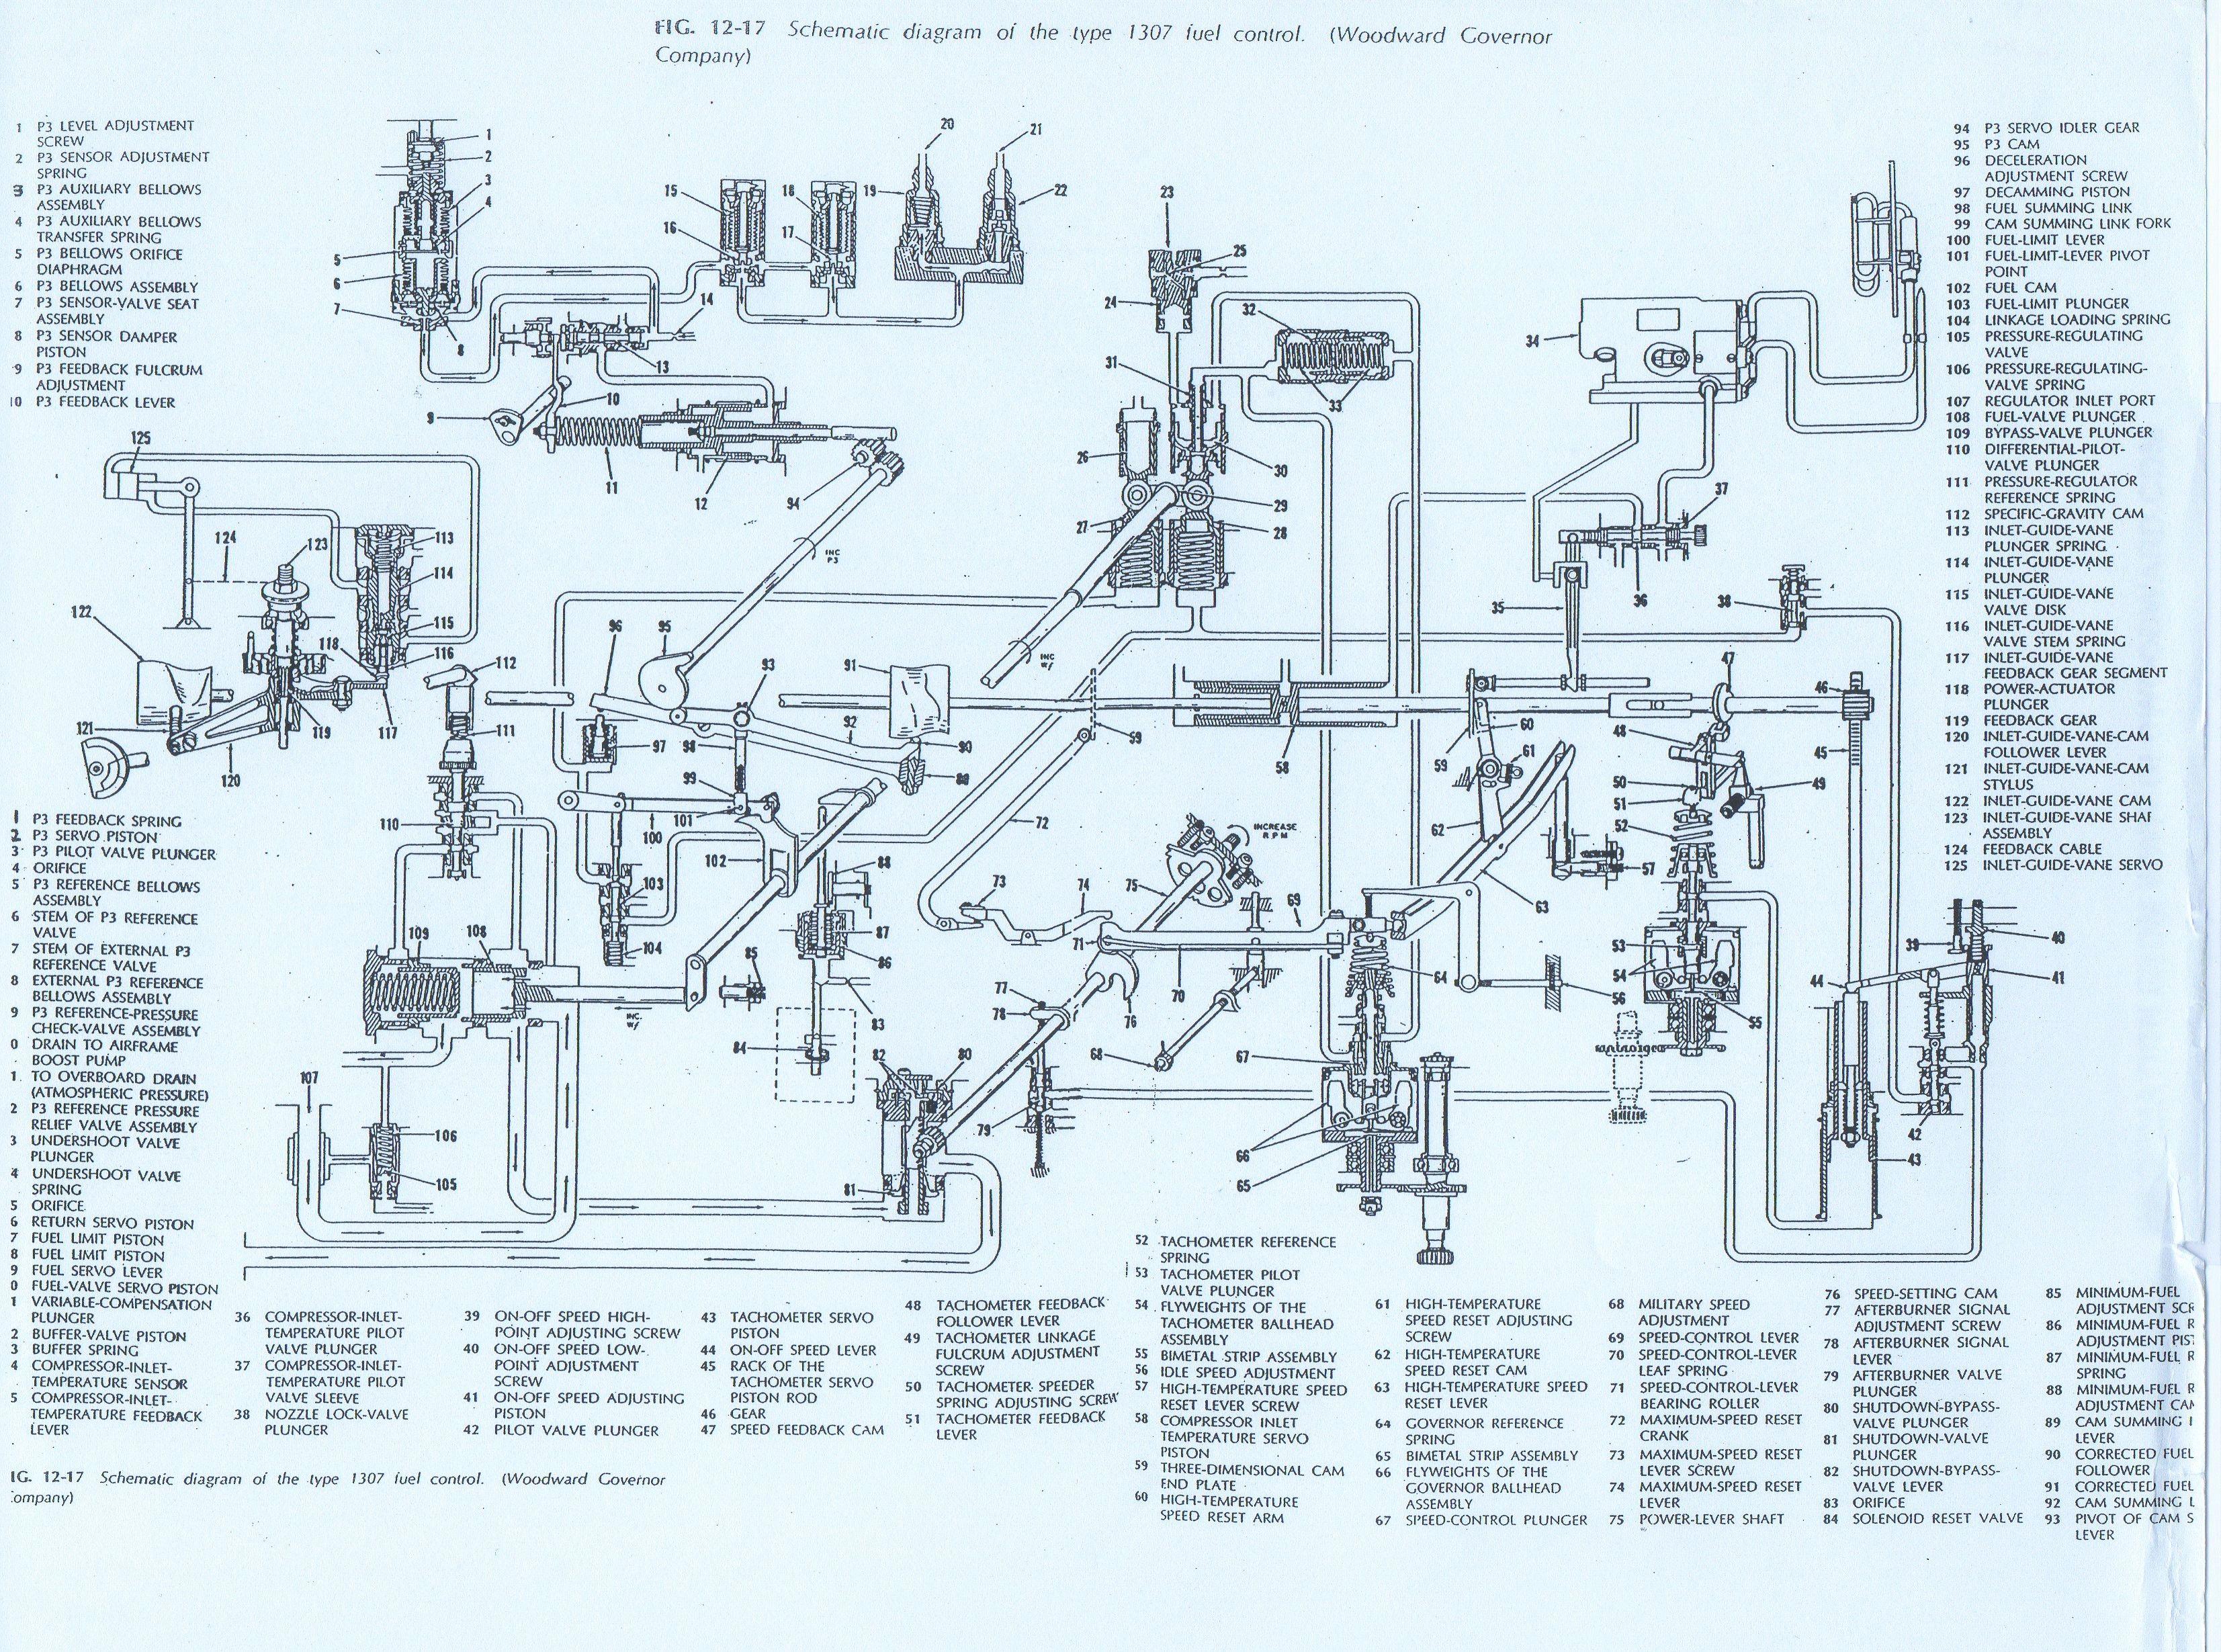 Woodward Governor Companys first jet engine series 1307 main – Jet Engine Schematics